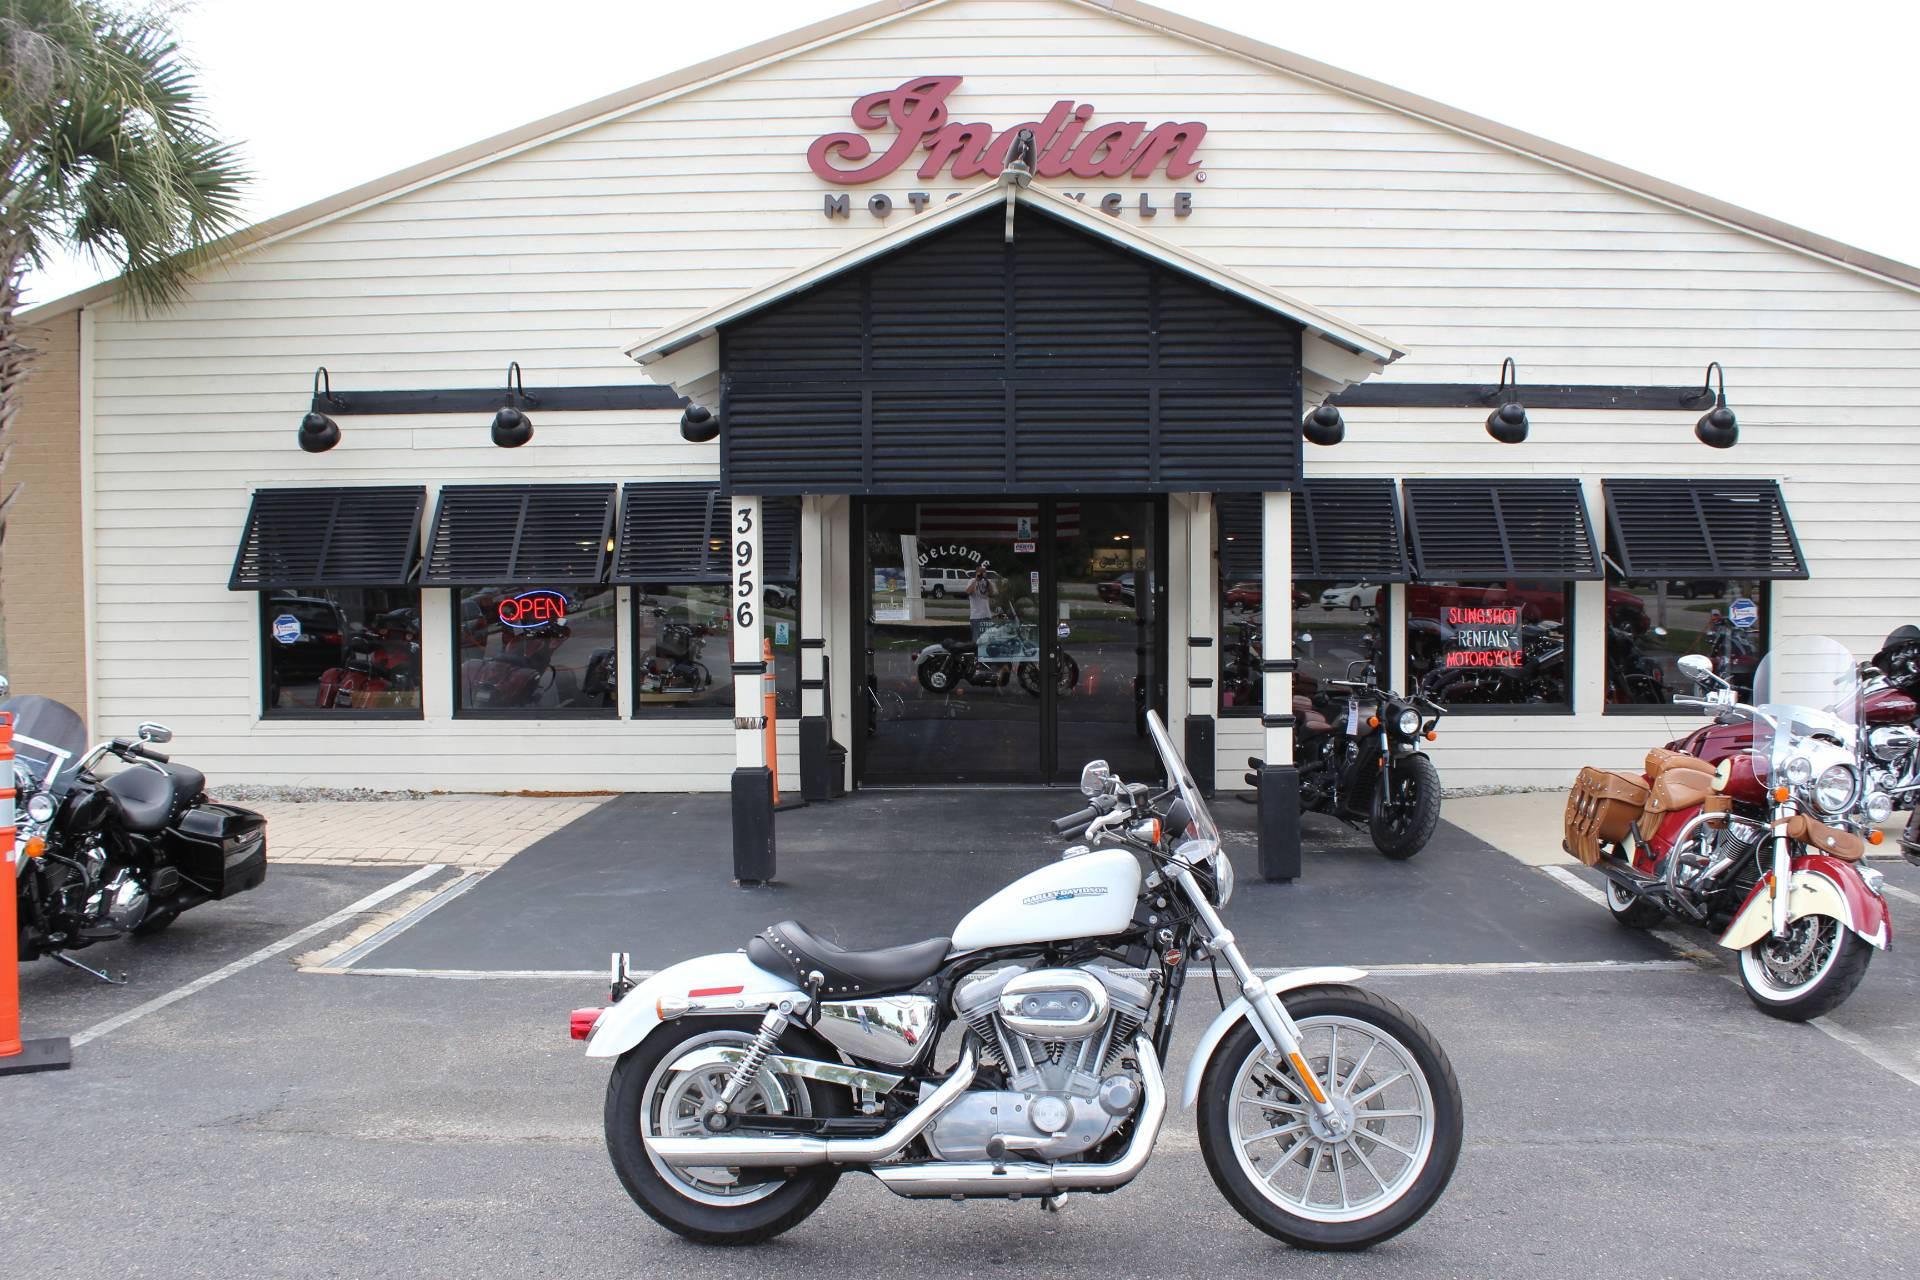 2006 Harley-Davidson Sportster® 883 Custom in Murrells Inlet, South Carolina